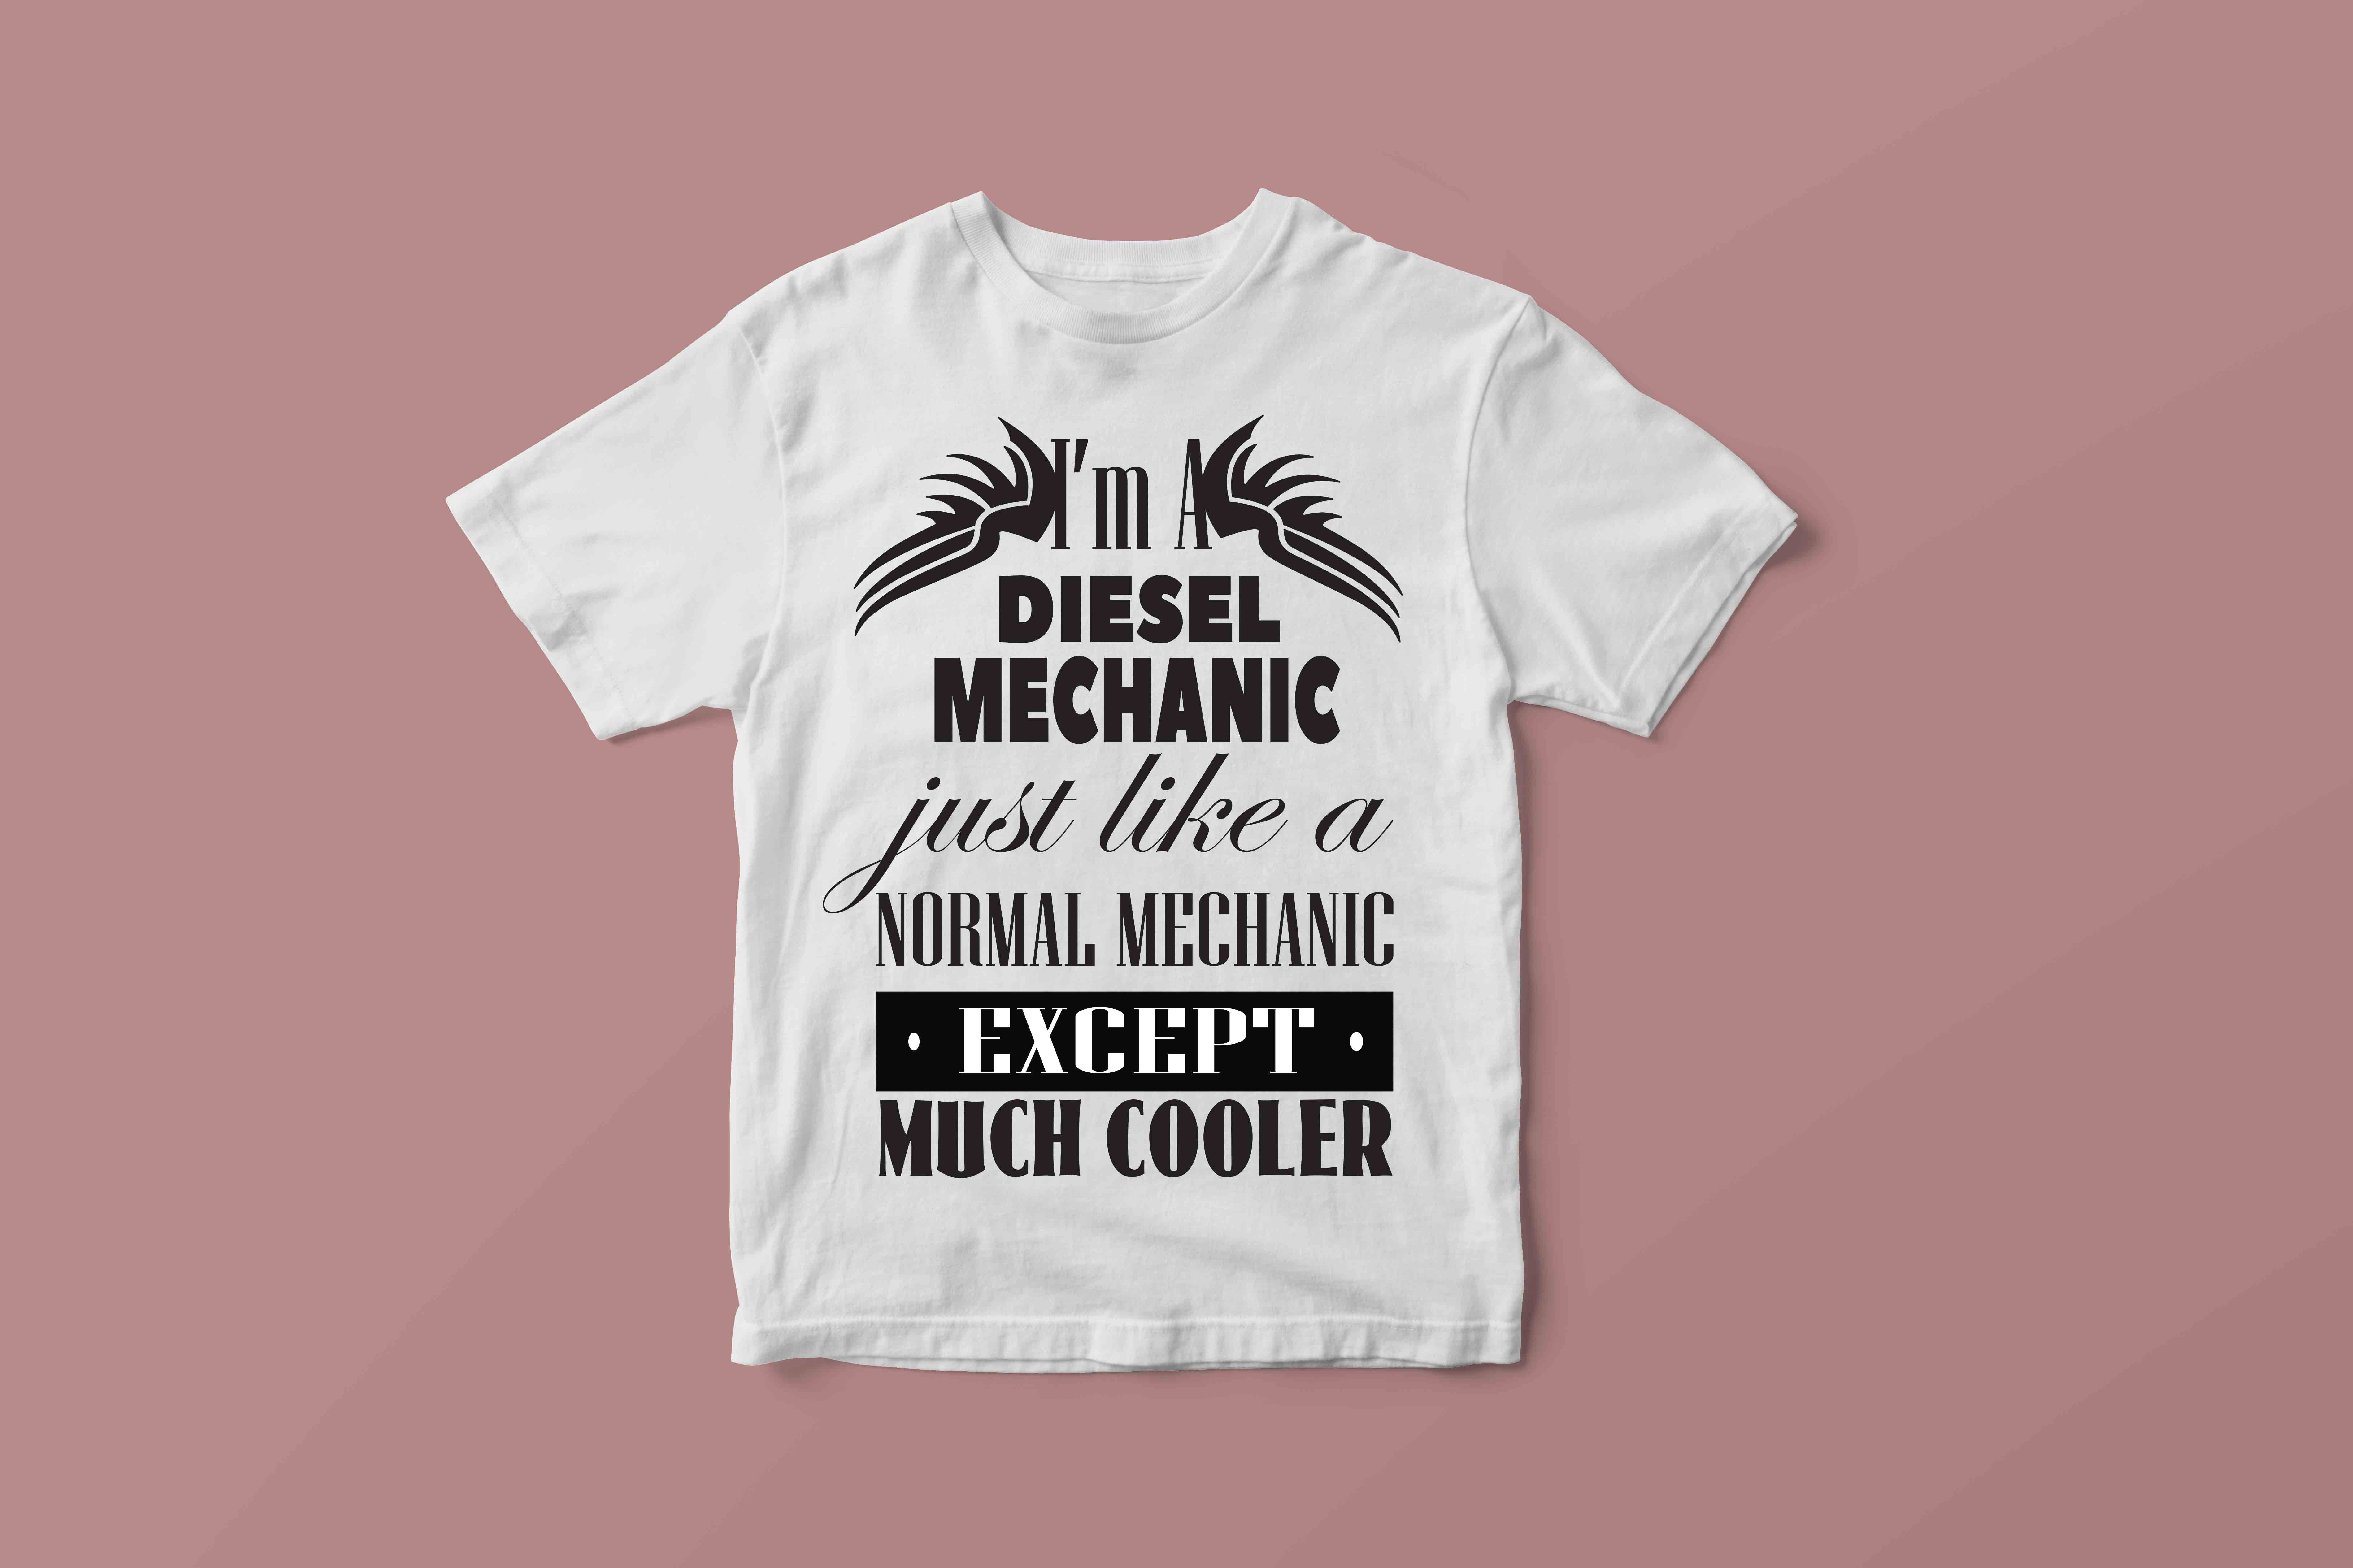 921da37d4 Ck Roy Hello guys, I am a professional graphic designer. I will create t  shirt design, business card design, logo design, etc. any one need contact  me.